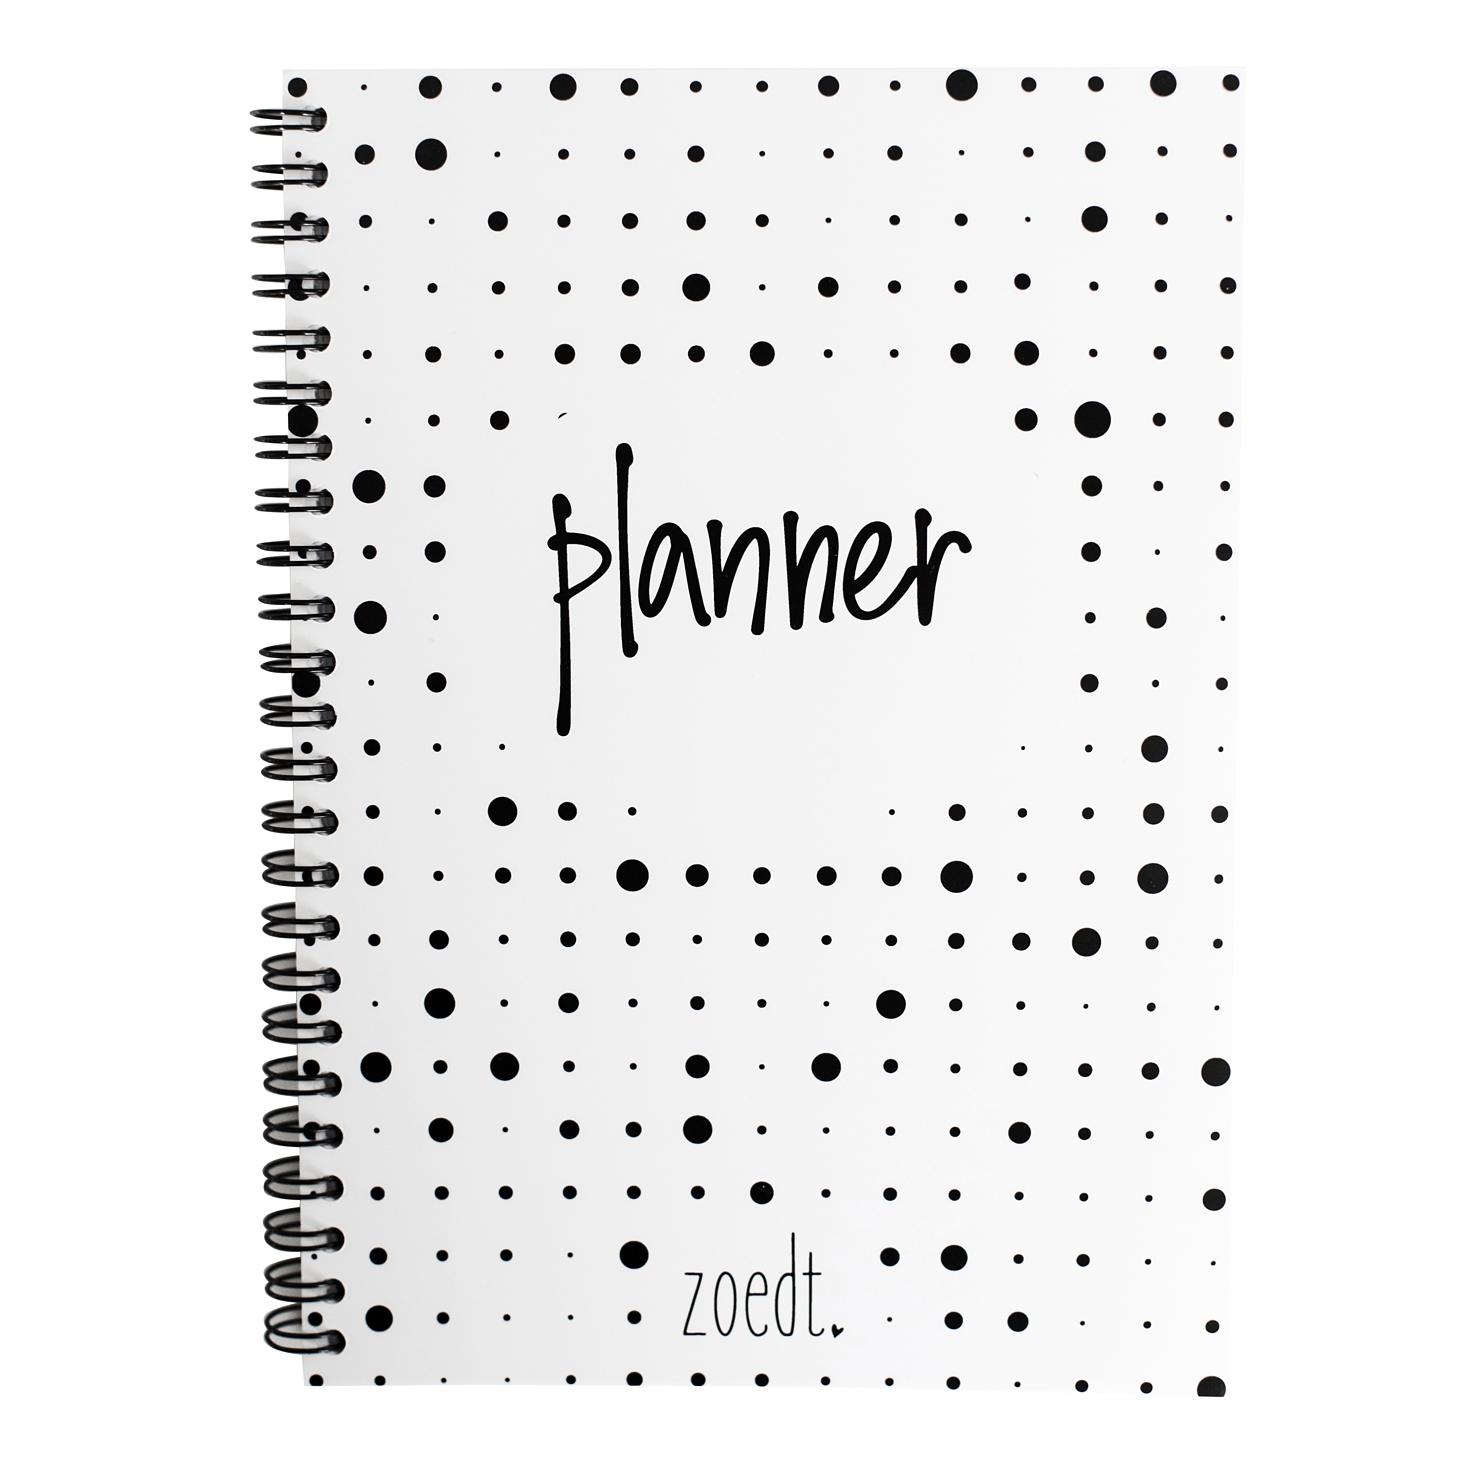 Planners-zoedt